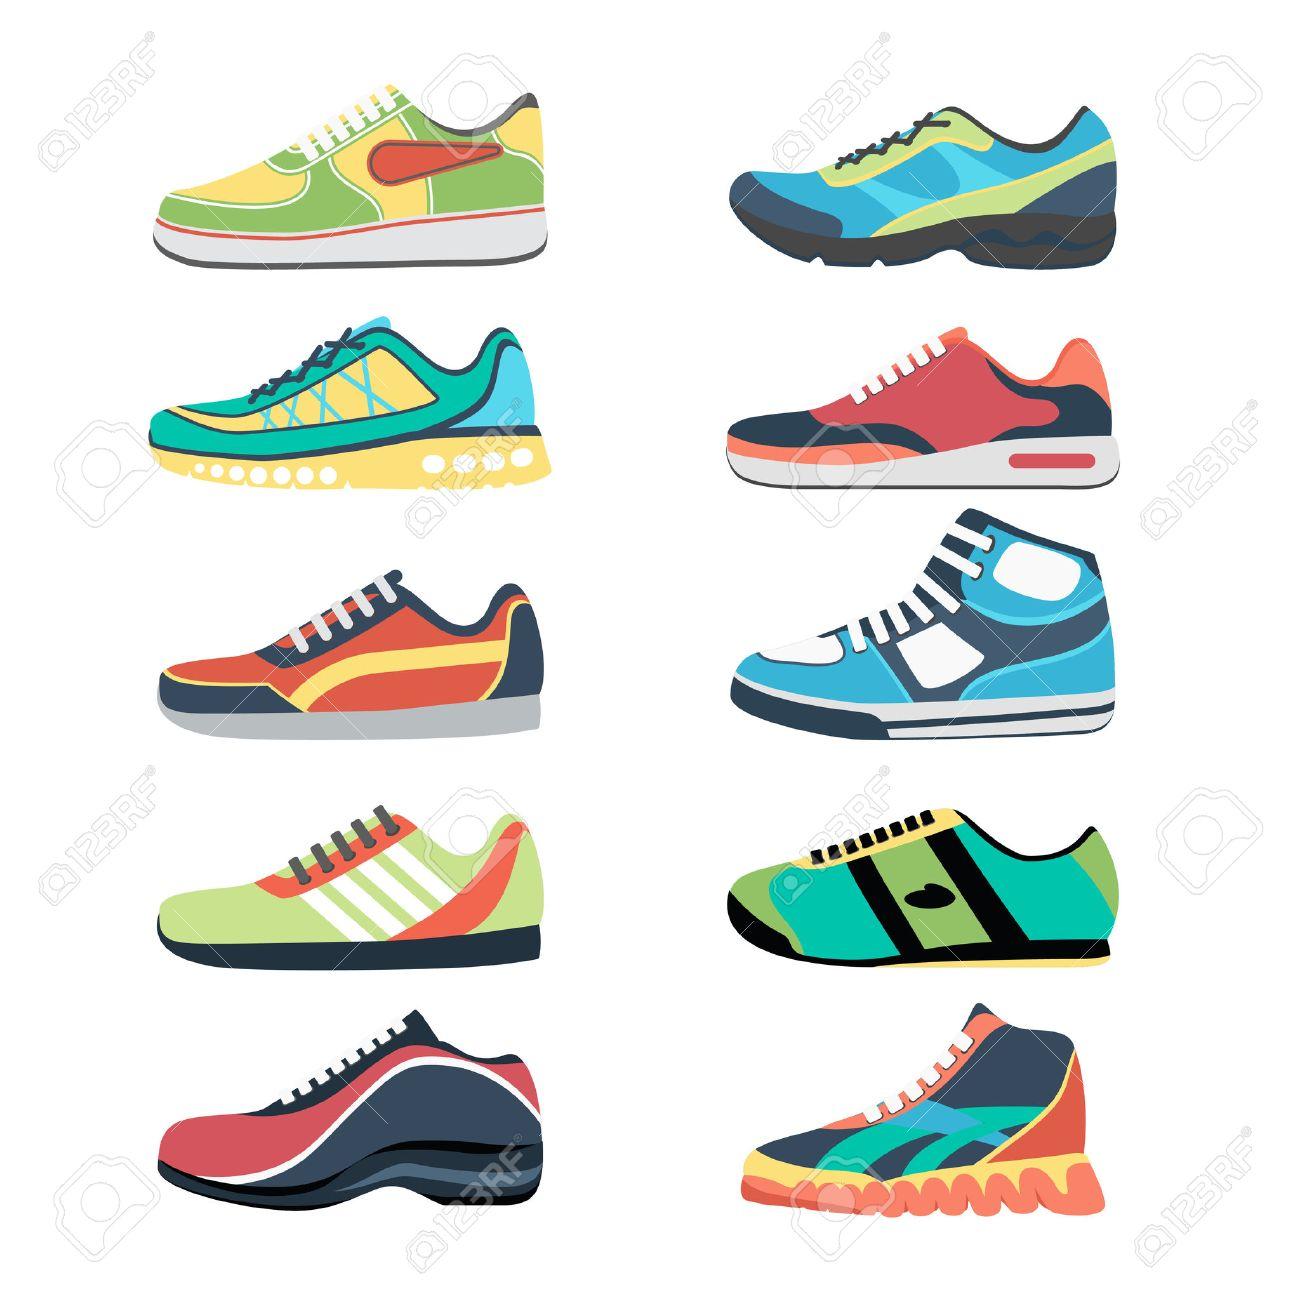 Sports shoes vector set. Fashion sportwear, everyday sneaker, footwear clothing illustration - 45979898